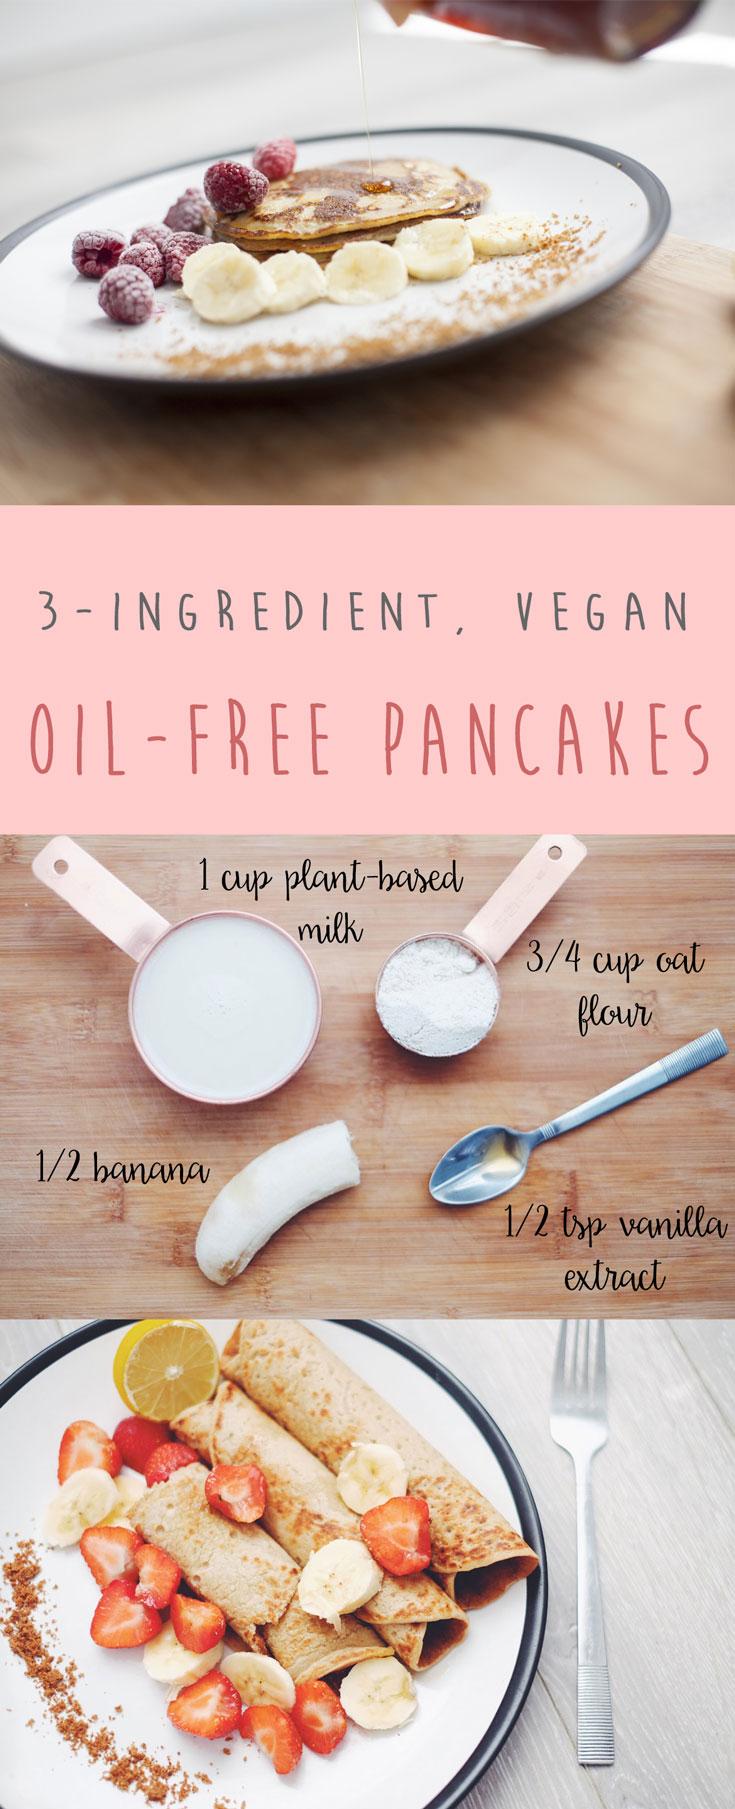 Oil-free vegan pancakes Pinterest